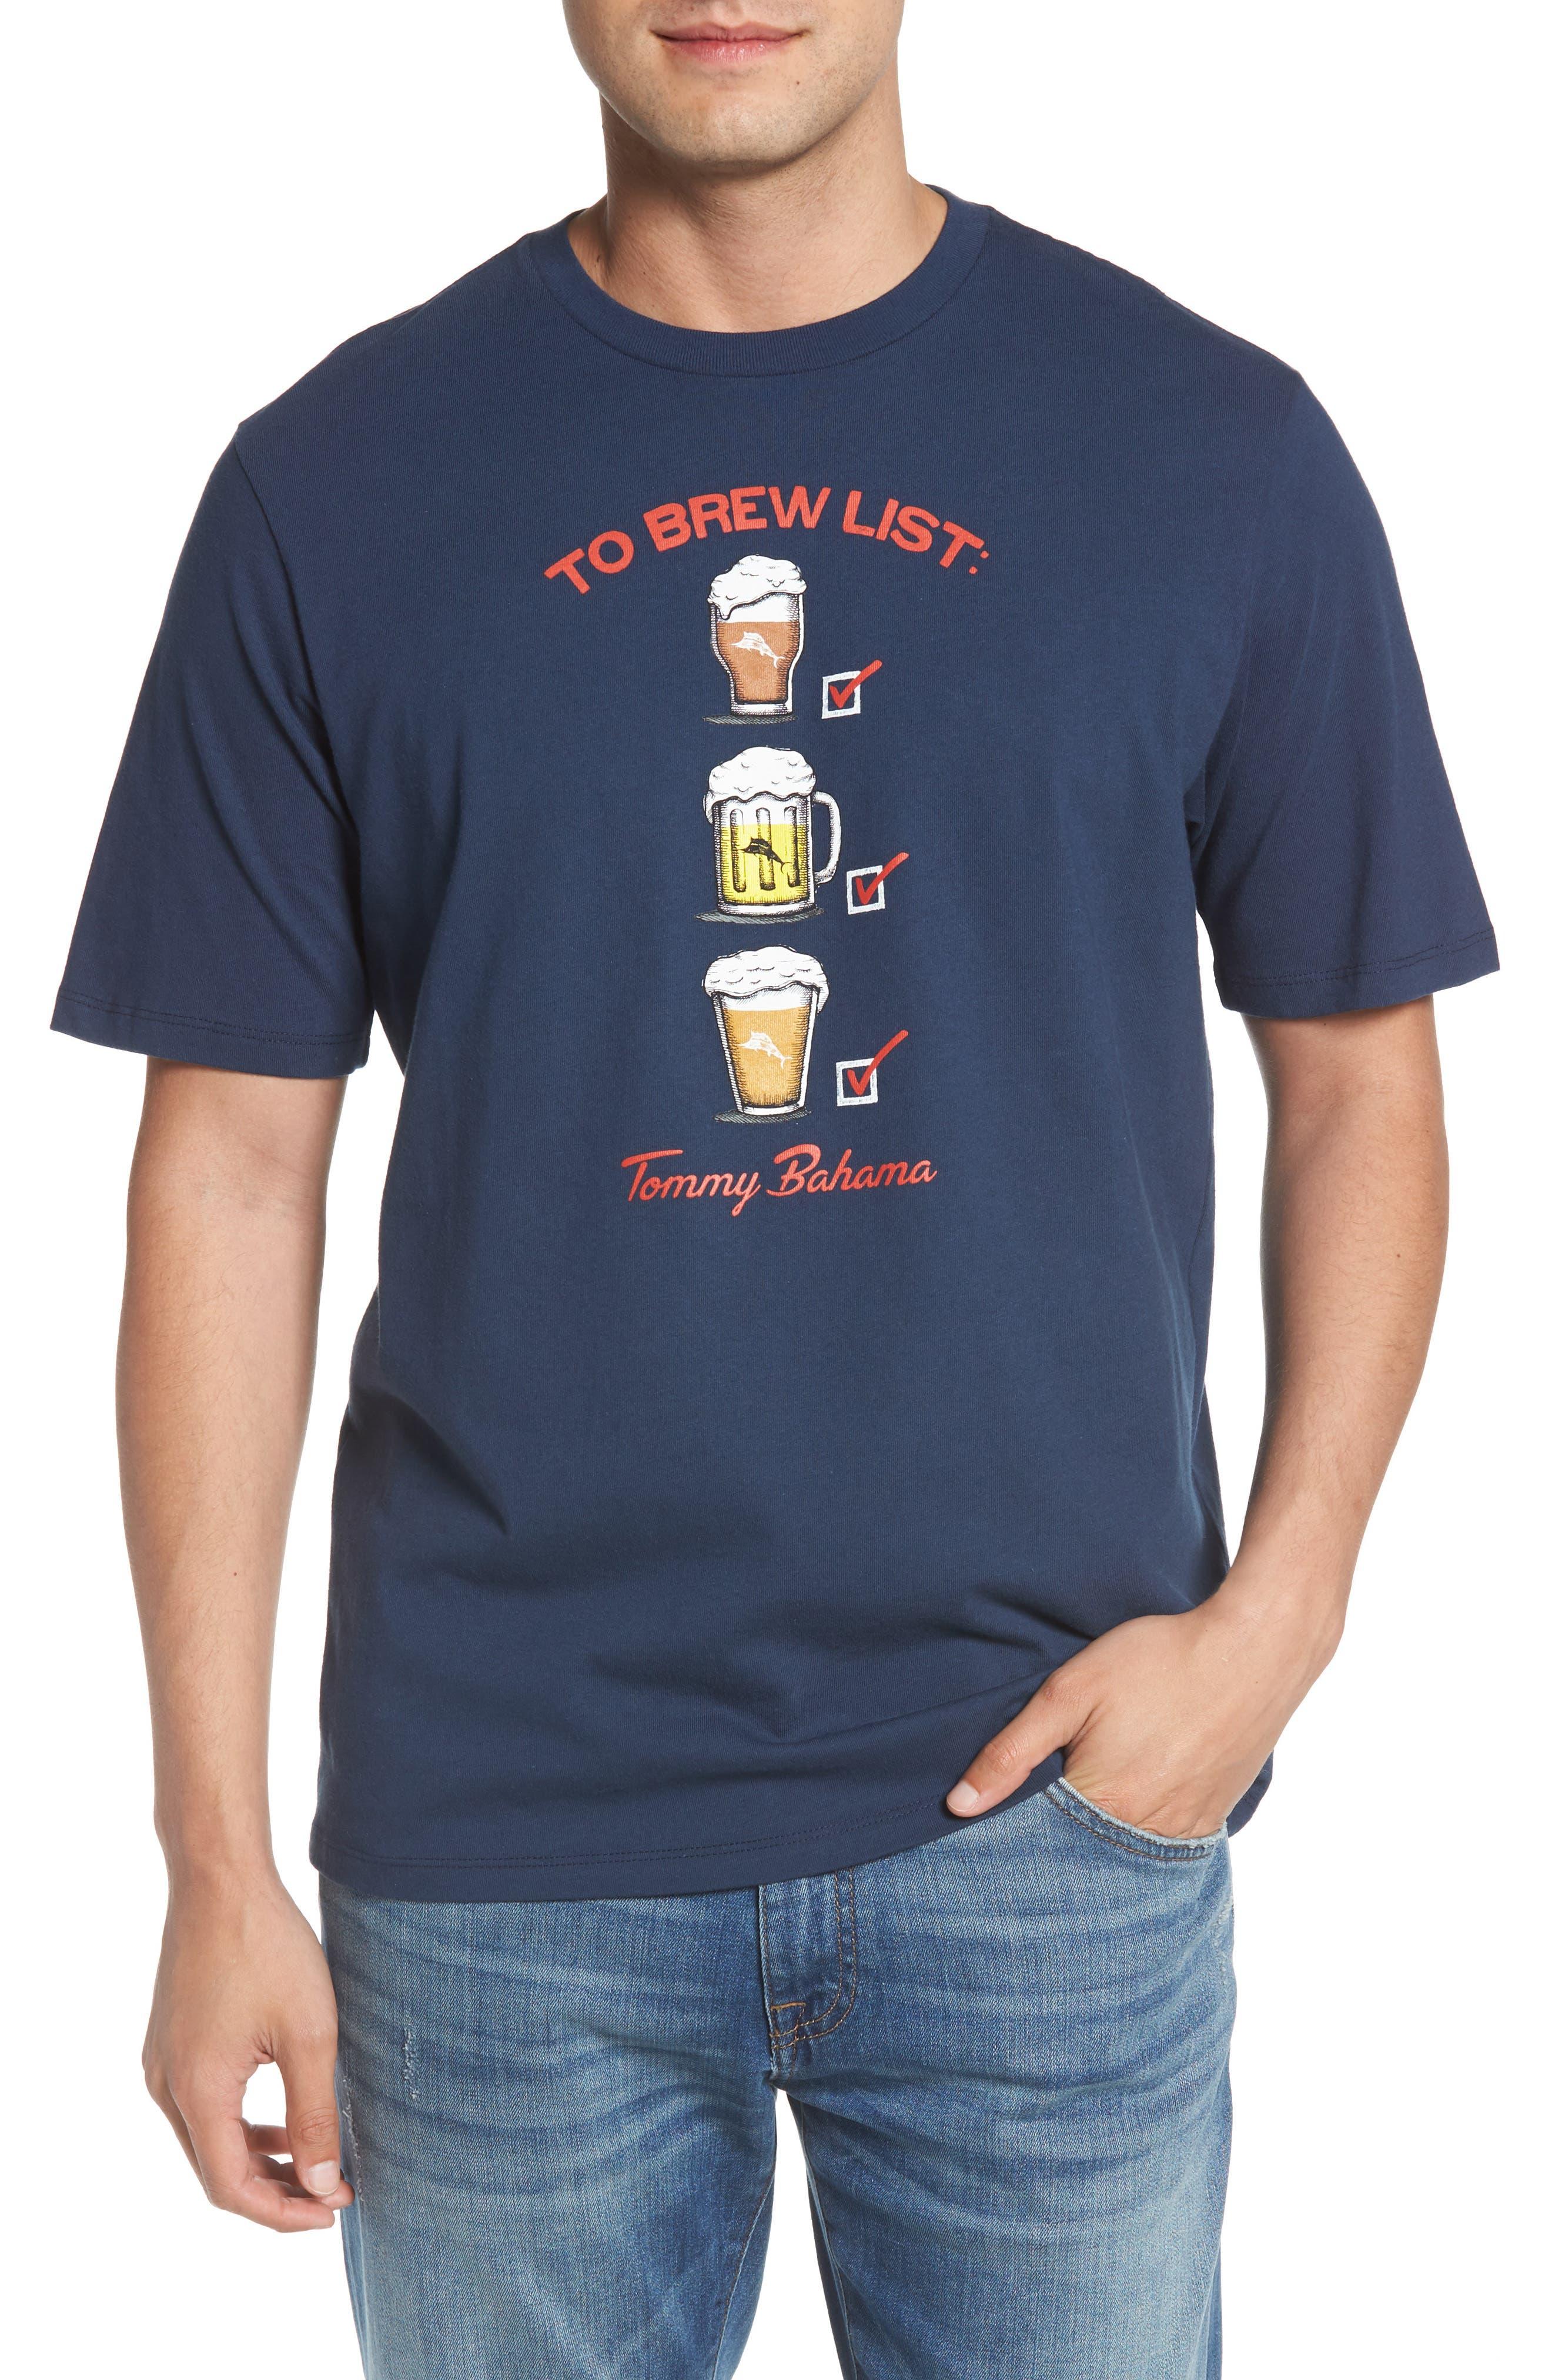 To Brew List T-Shirt,                             Main thumbnail 1, color,                             400